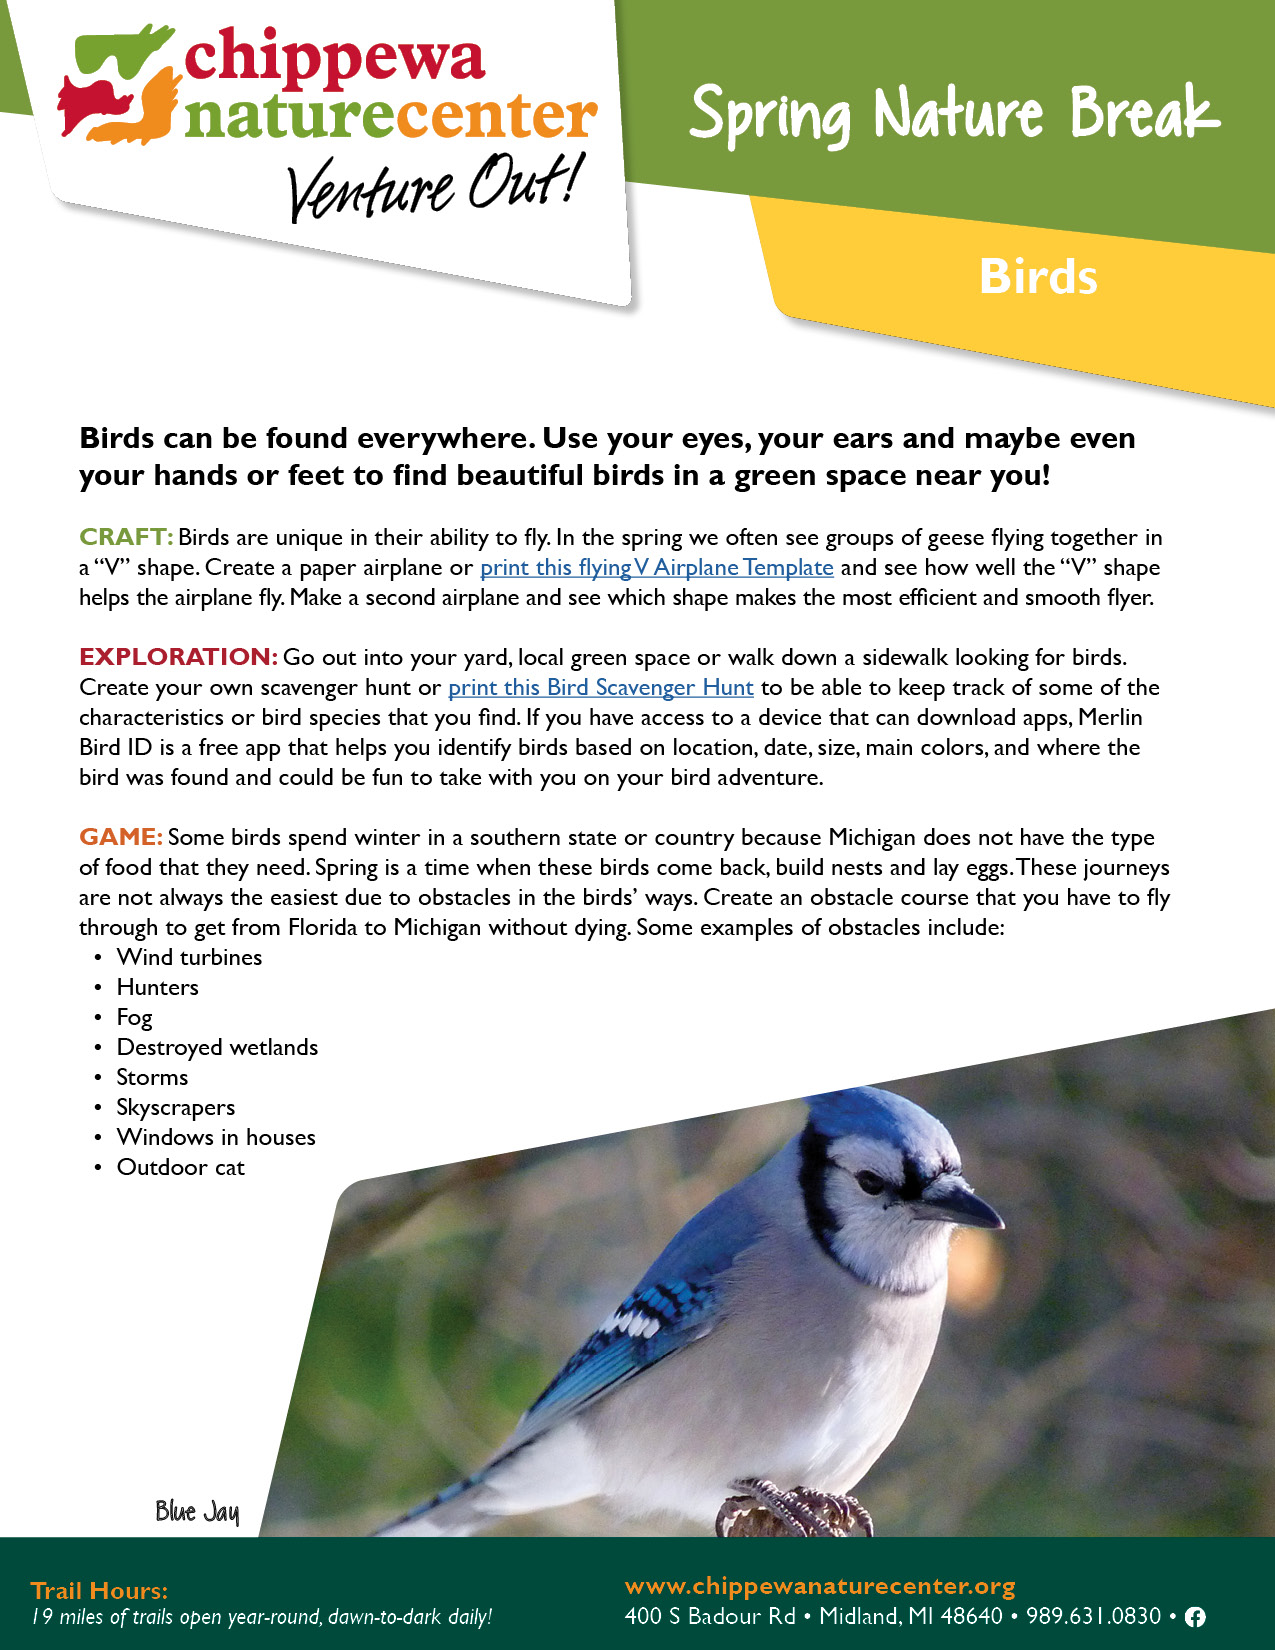 Spring Nature Break - Birds